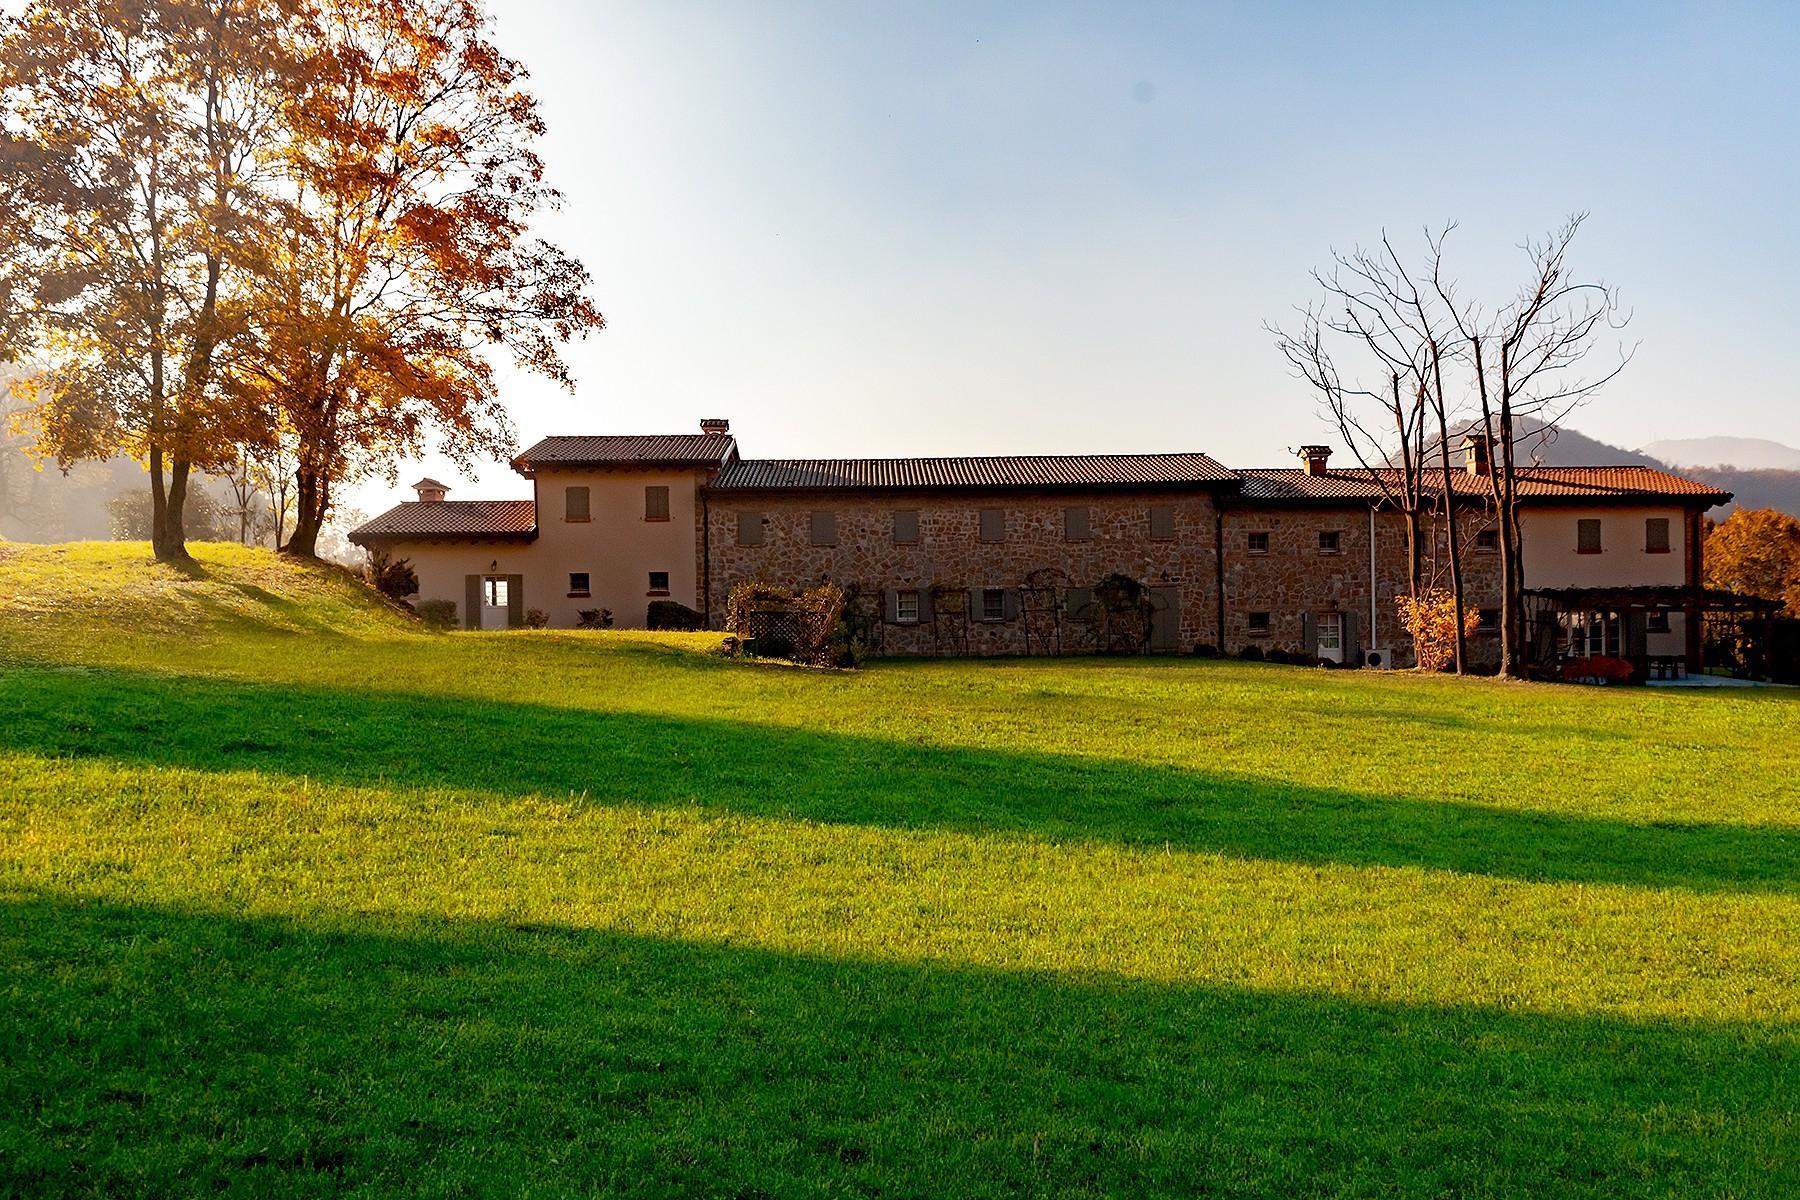 Rustico in Vendita a Padova: 5 locali, 850 mq - Foto 16